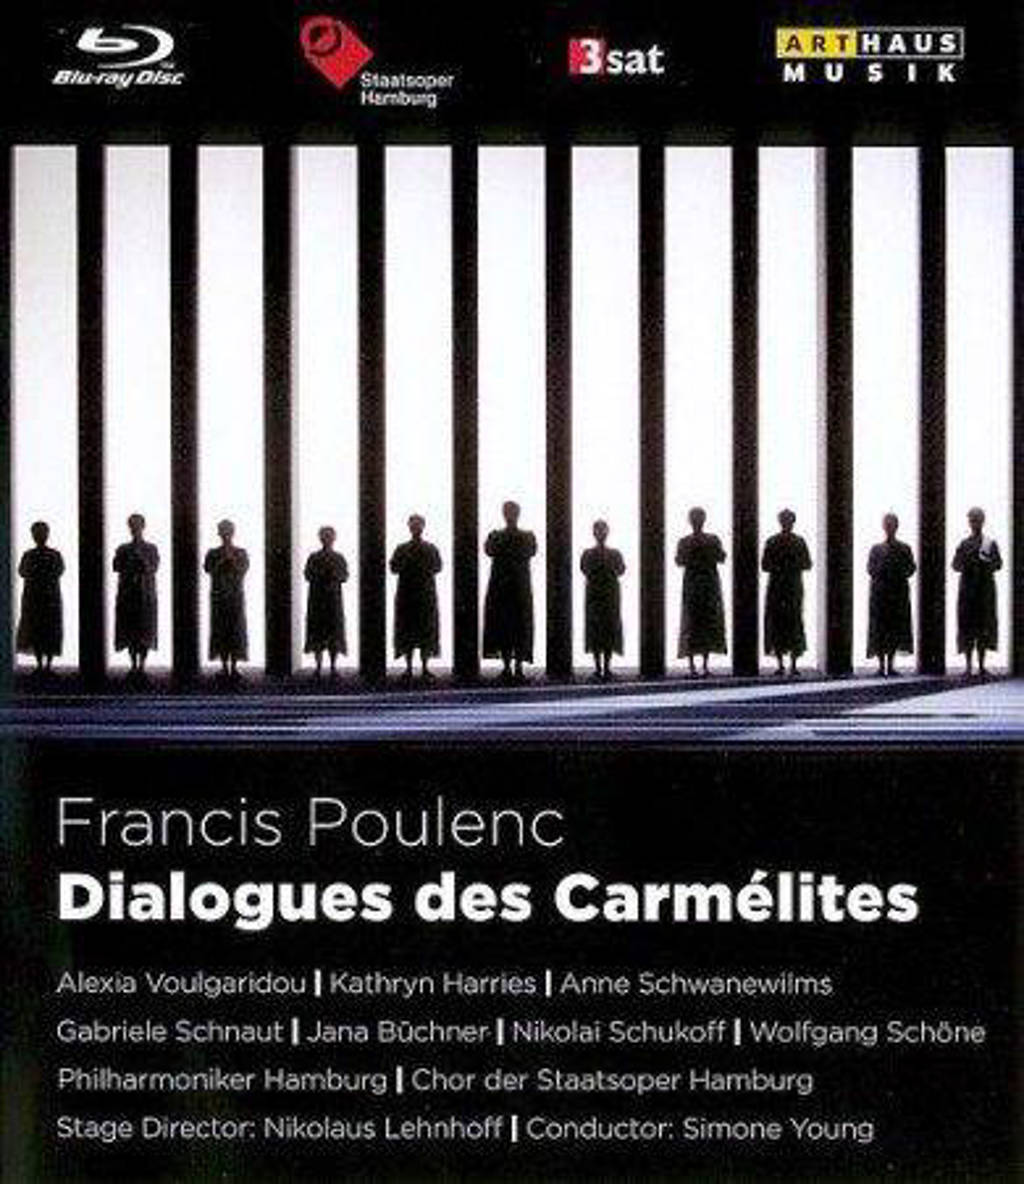 Dialogues des carmelites Hamburg 2008 (Blu-ray)